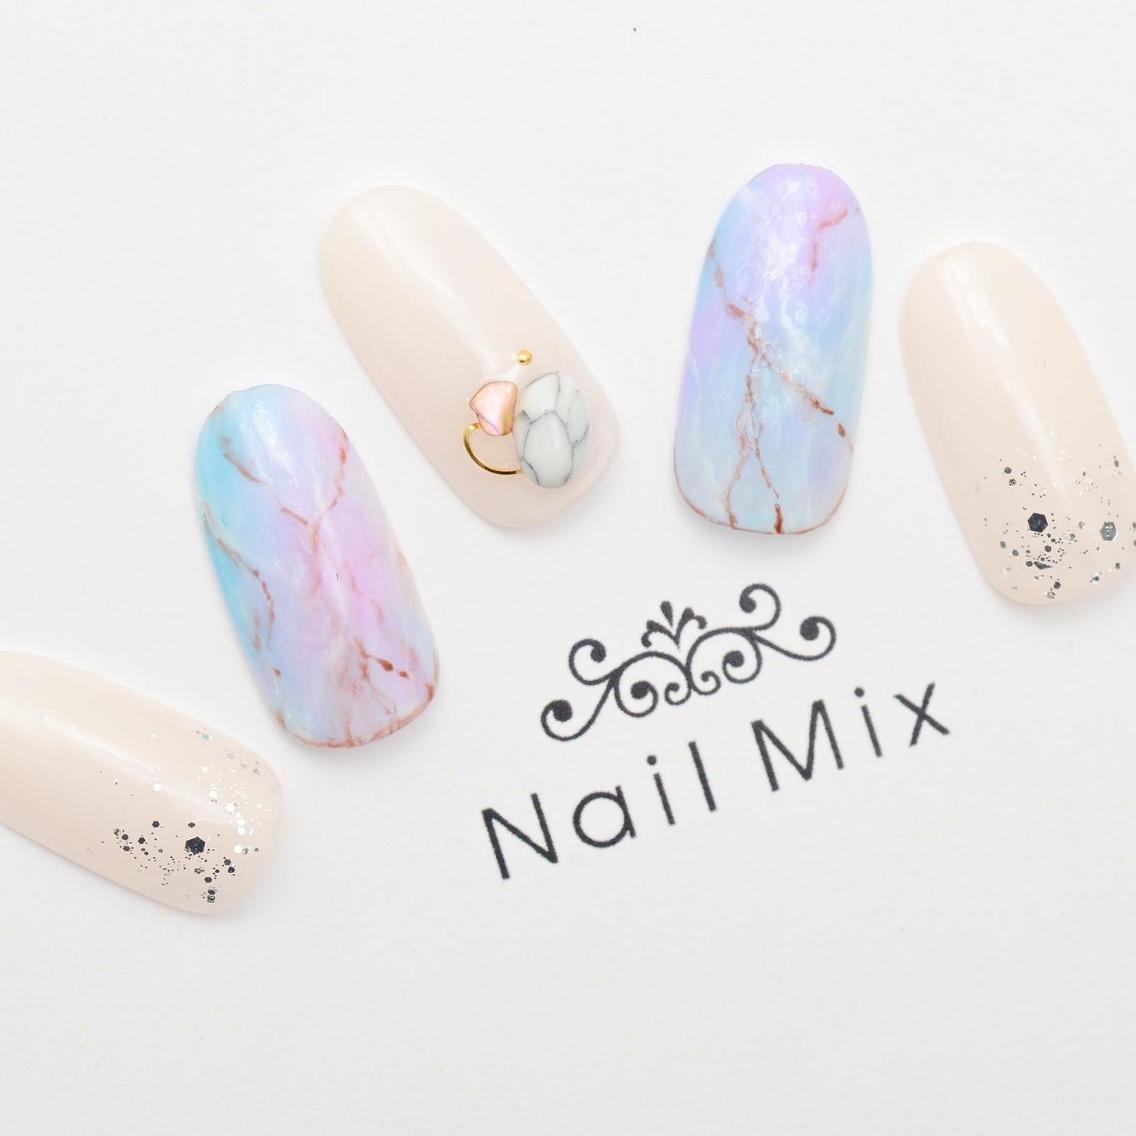 Nail Mix 福岡天神店所属・Nail Mix 福岡天神1の掲載